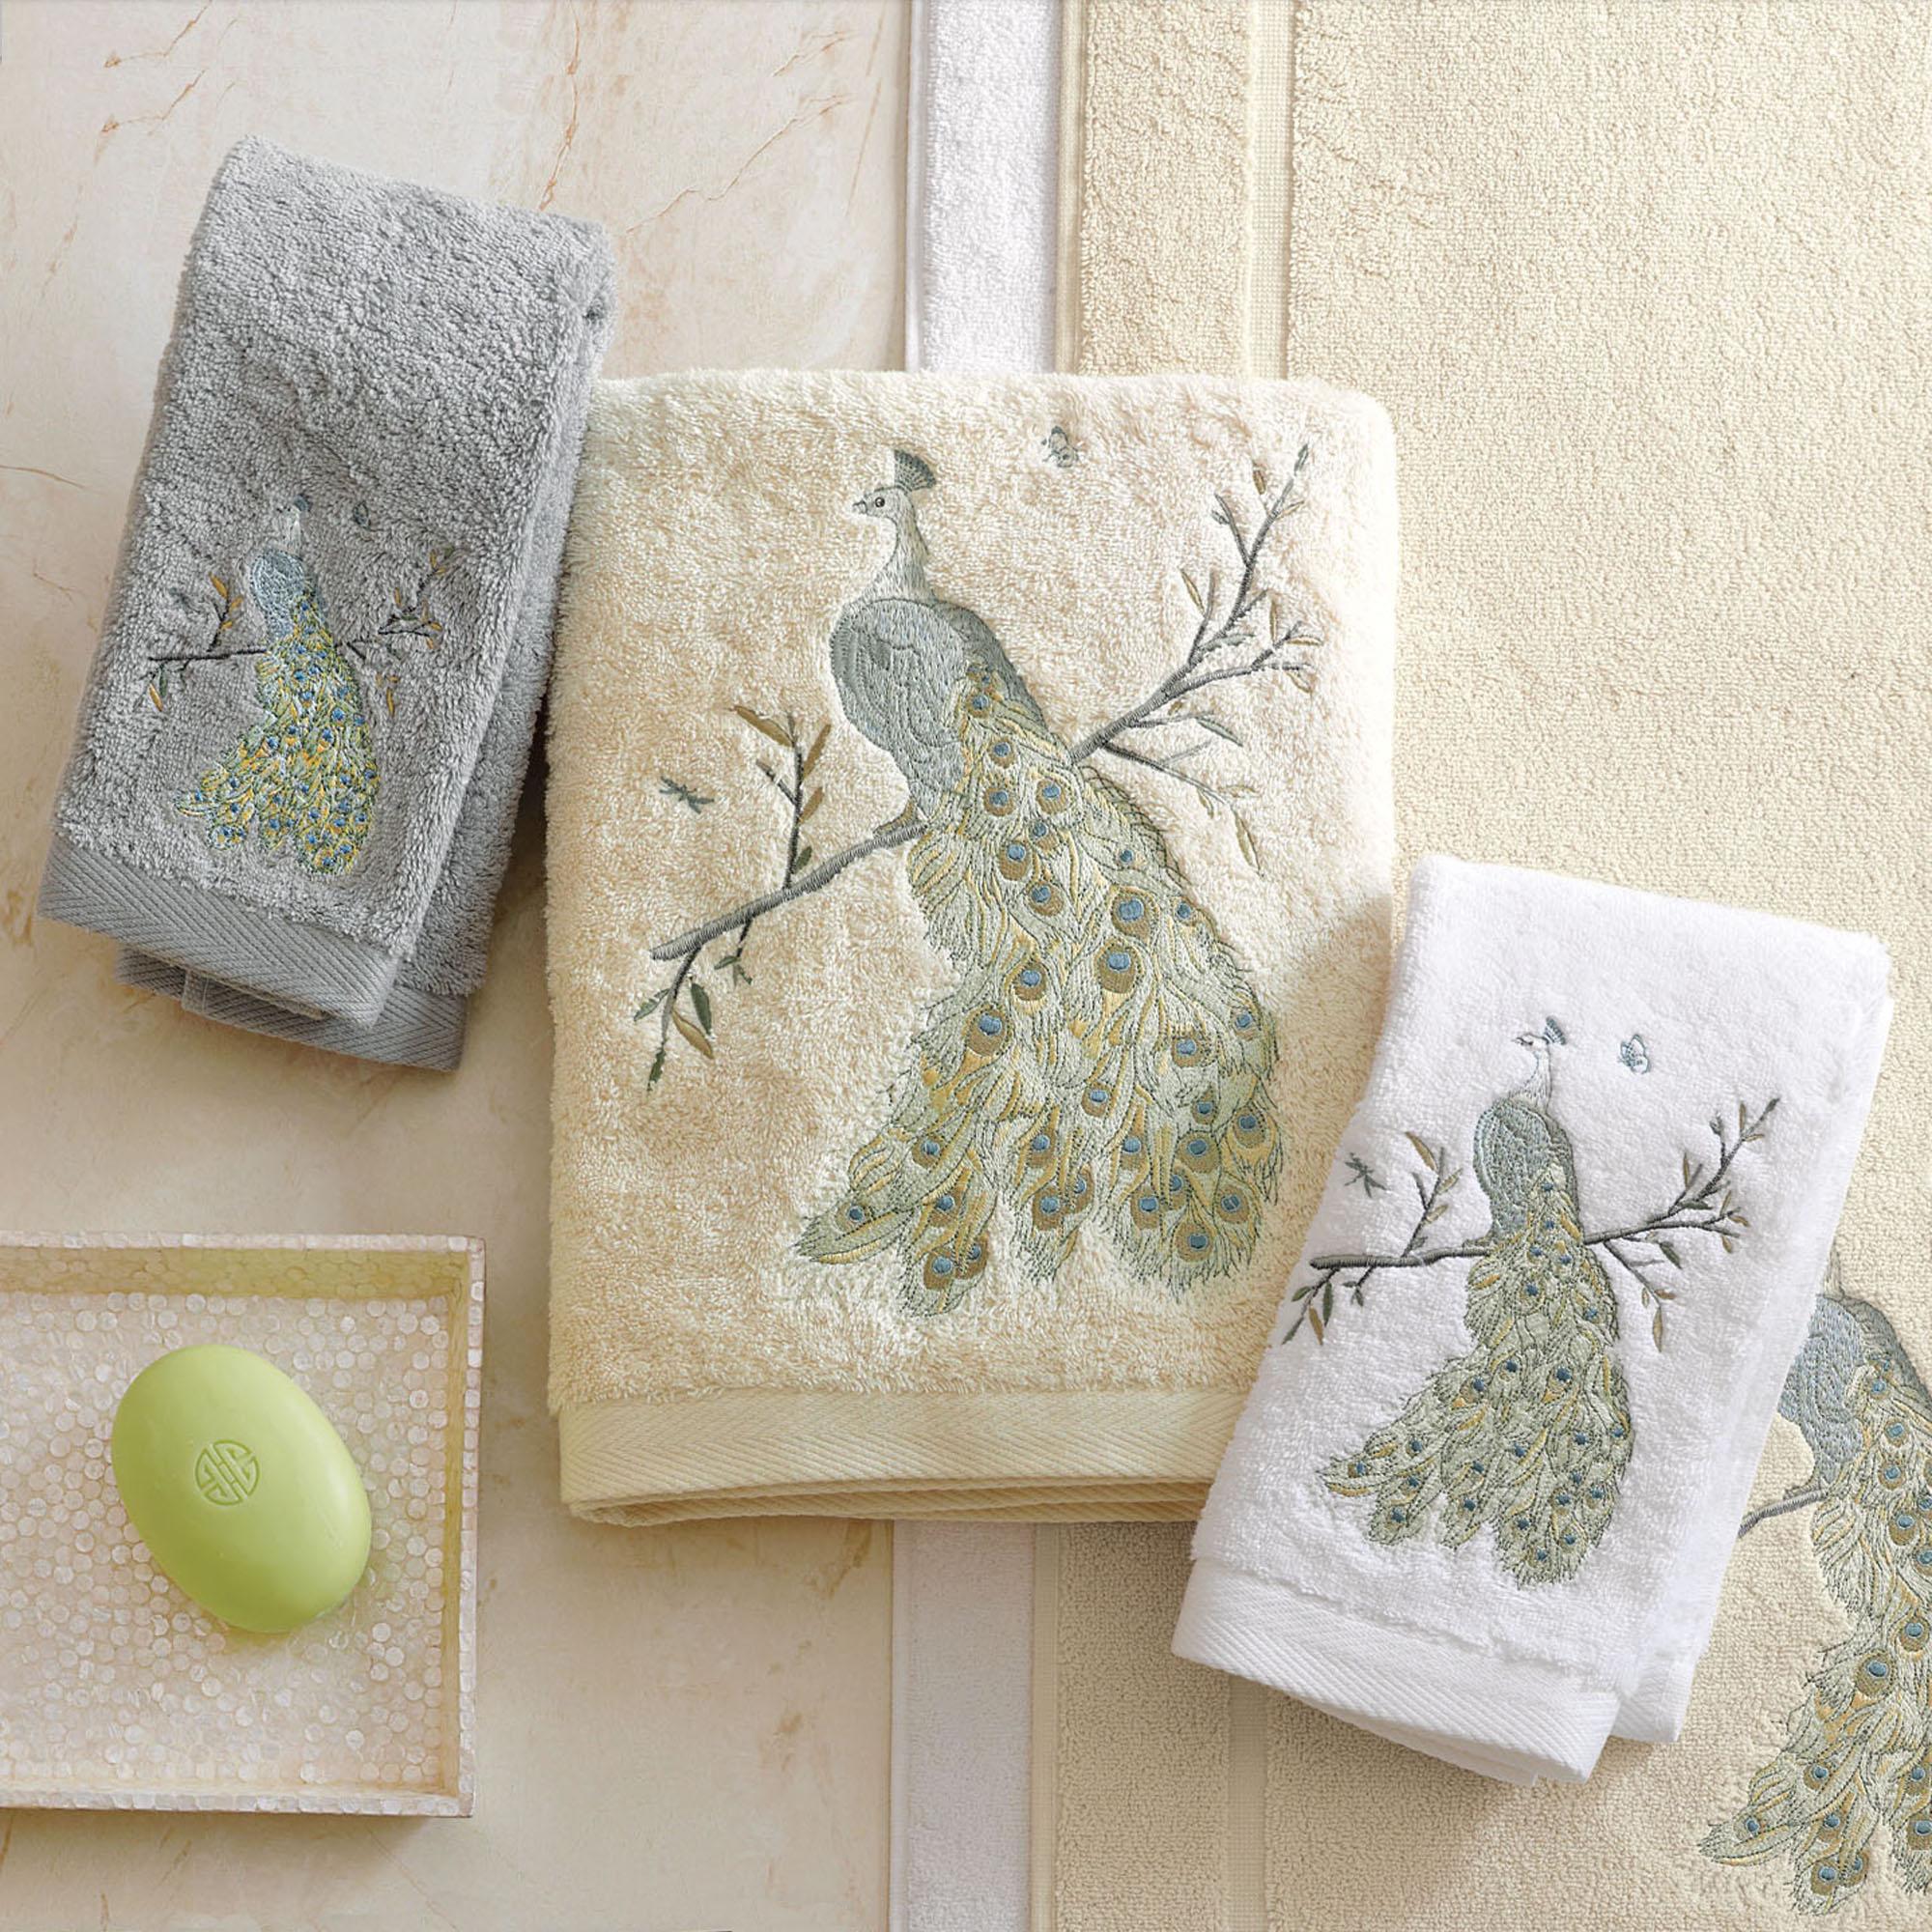 peacock embroidered towels gump 39 s. Black Bedroom Furniture Sets. Home Design Ideas